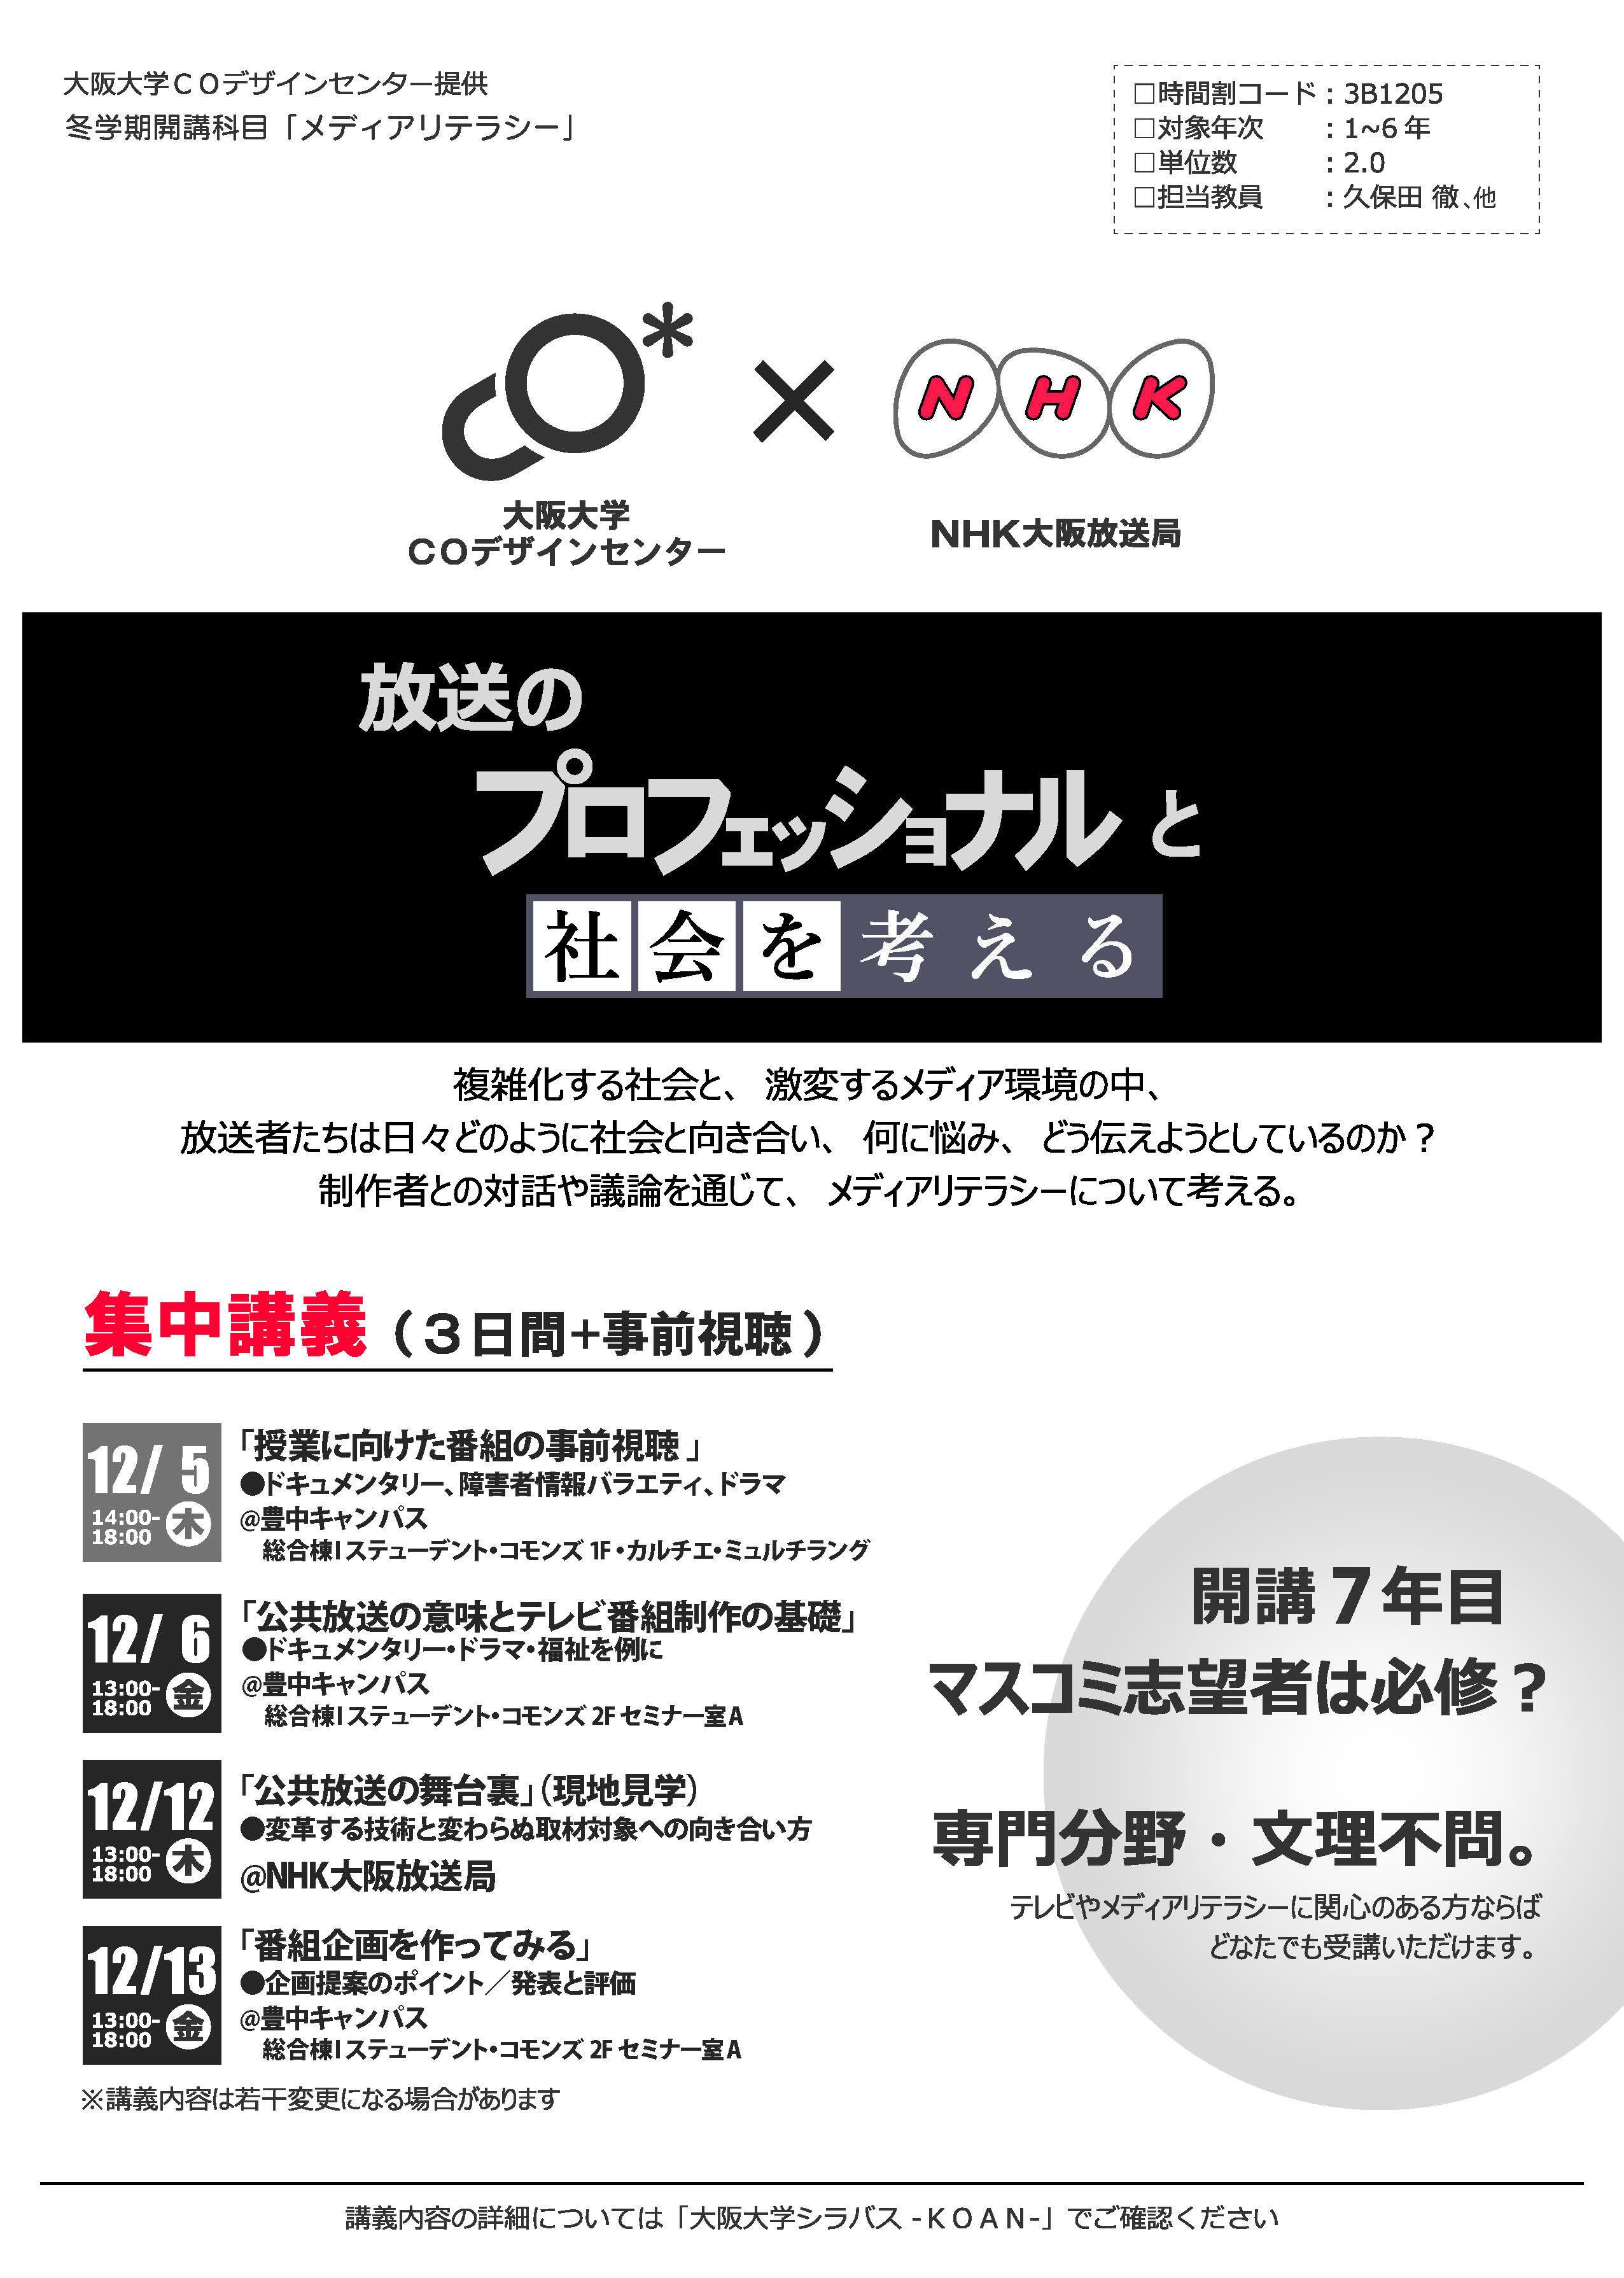 NHK講座ポスター2019_2.jpg